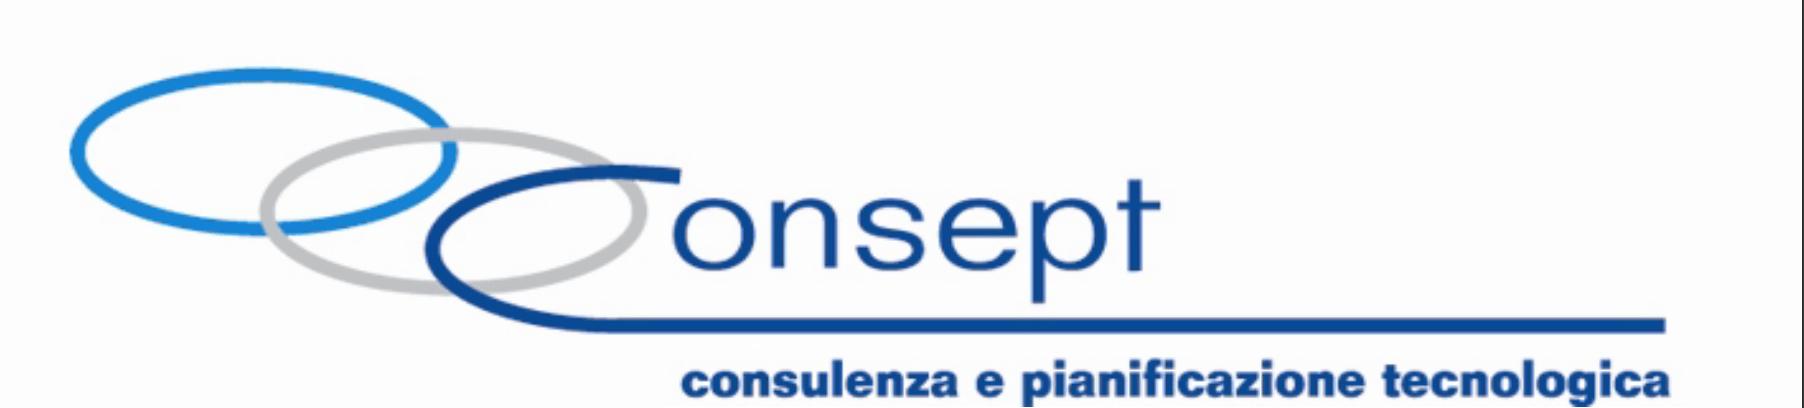 logo Consept